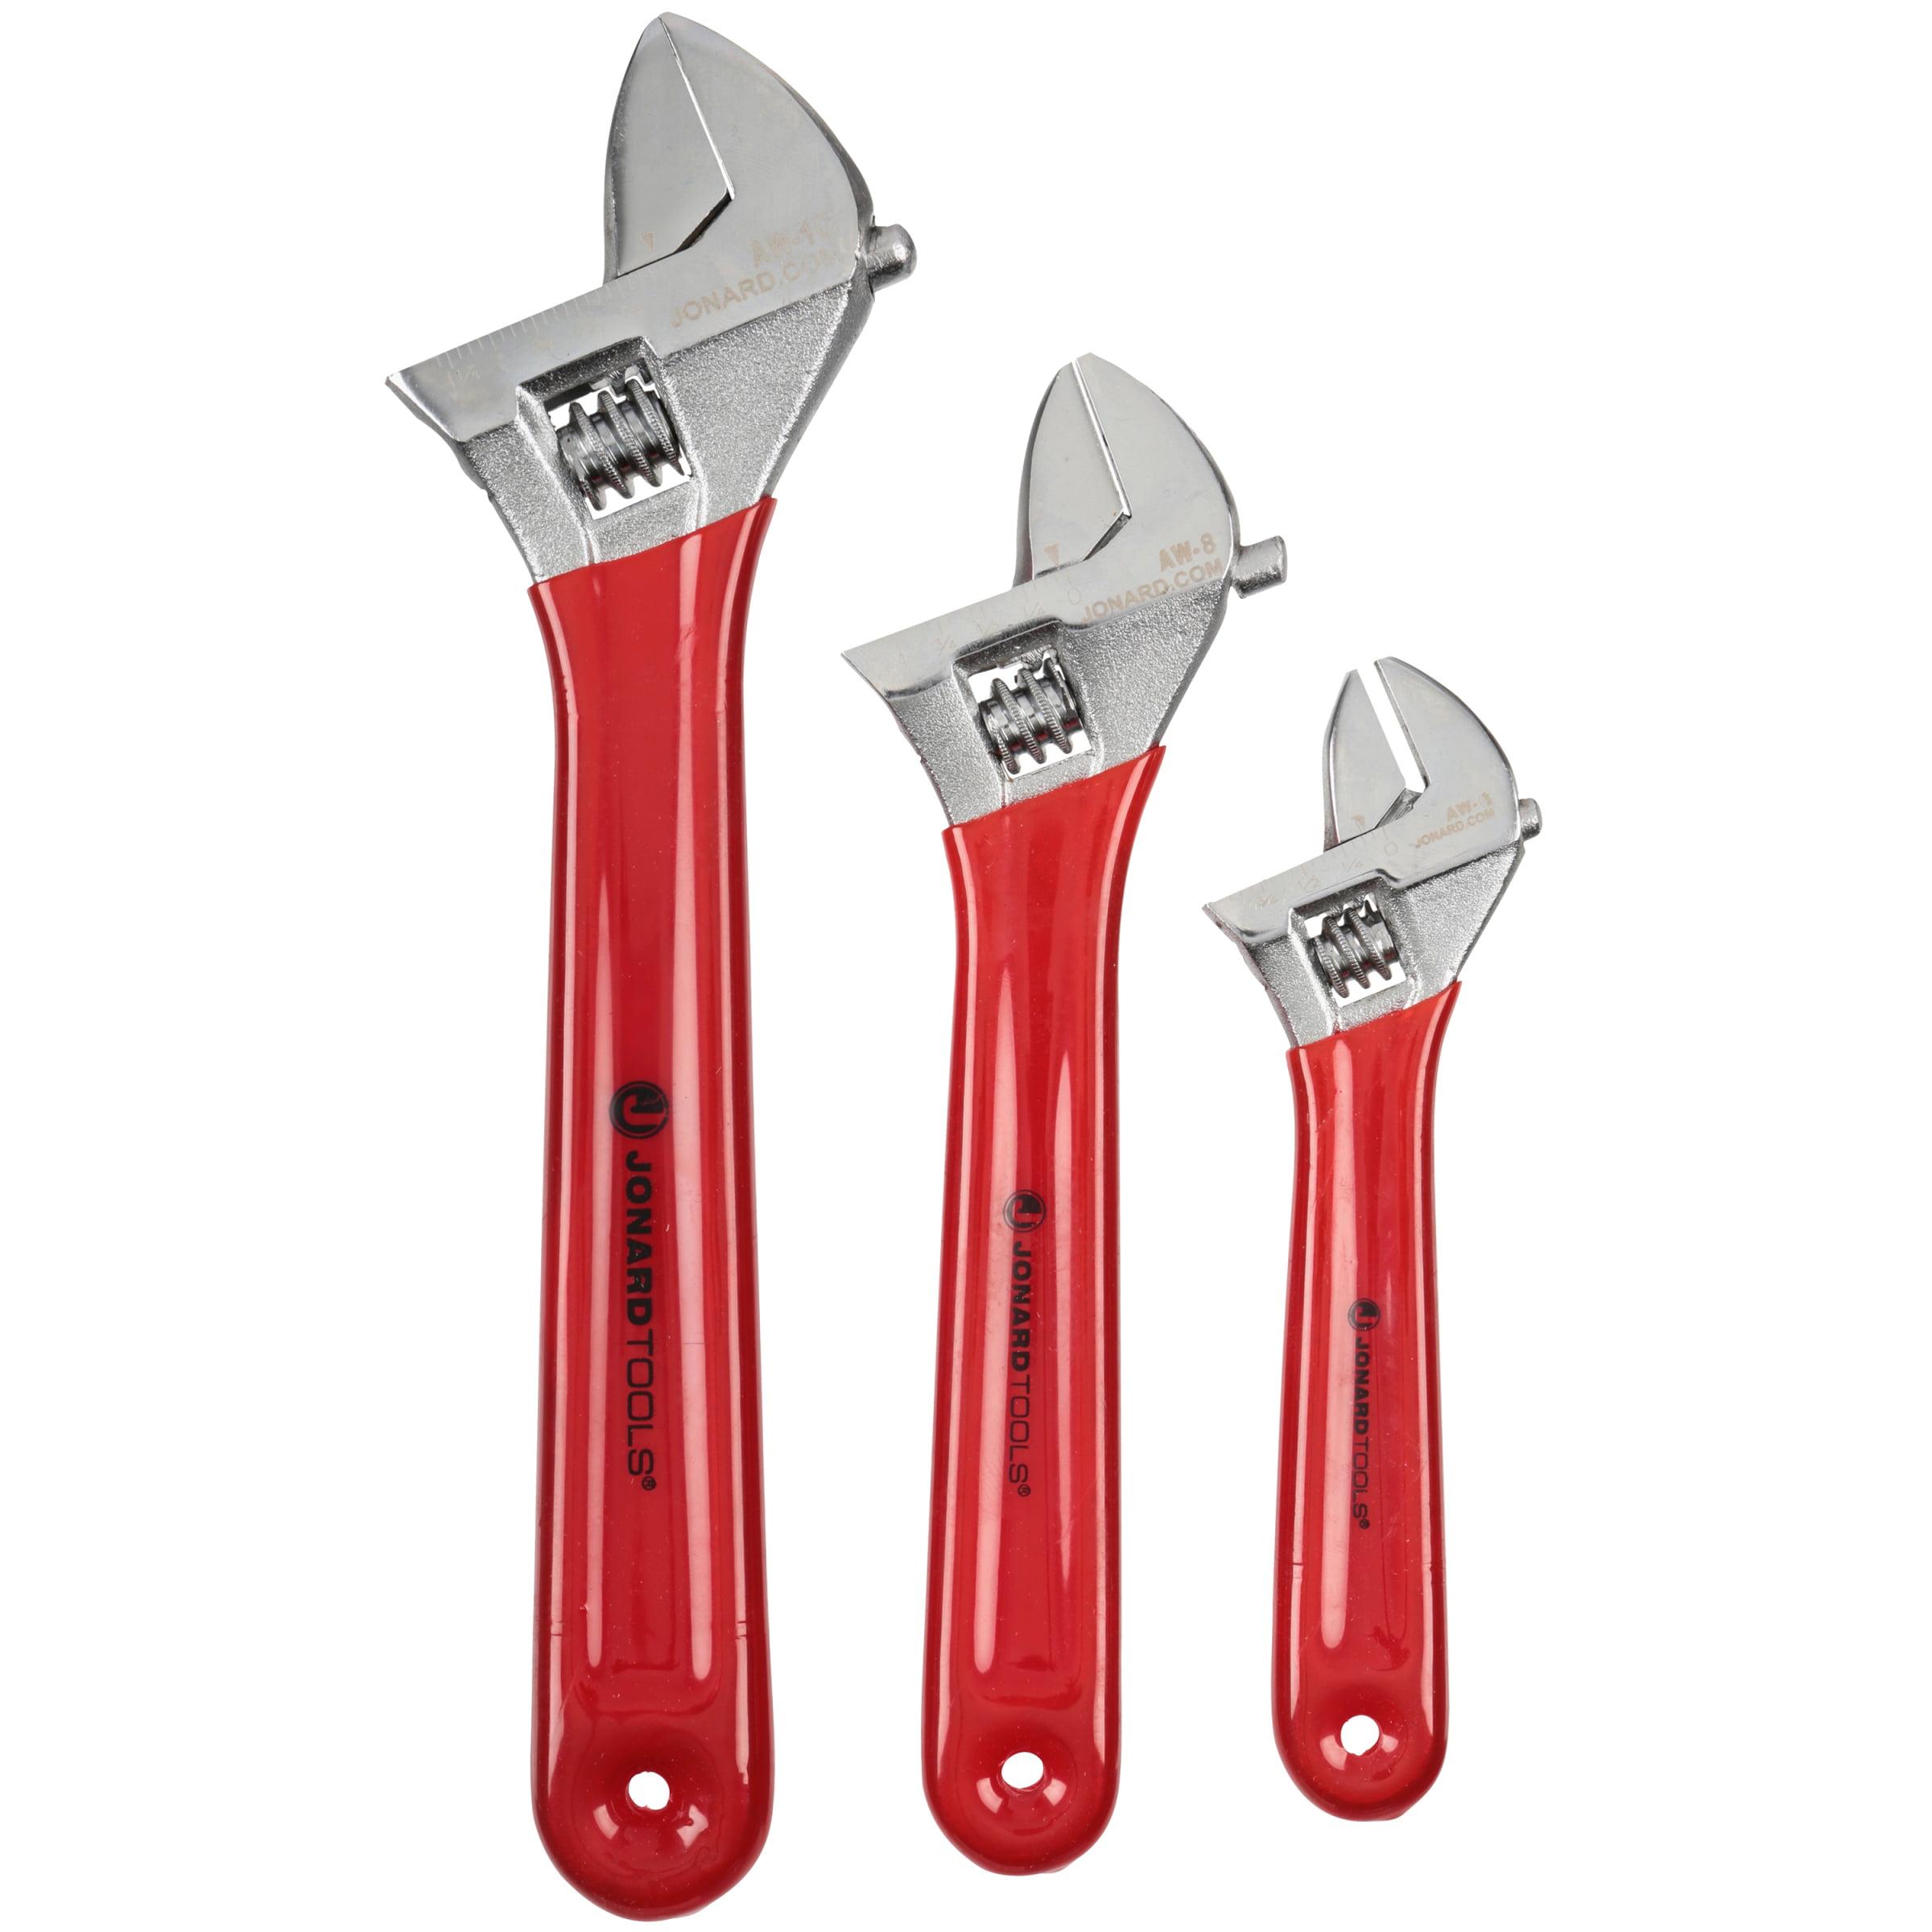 Jonard Industries Adjustable Wrench 12-Inch